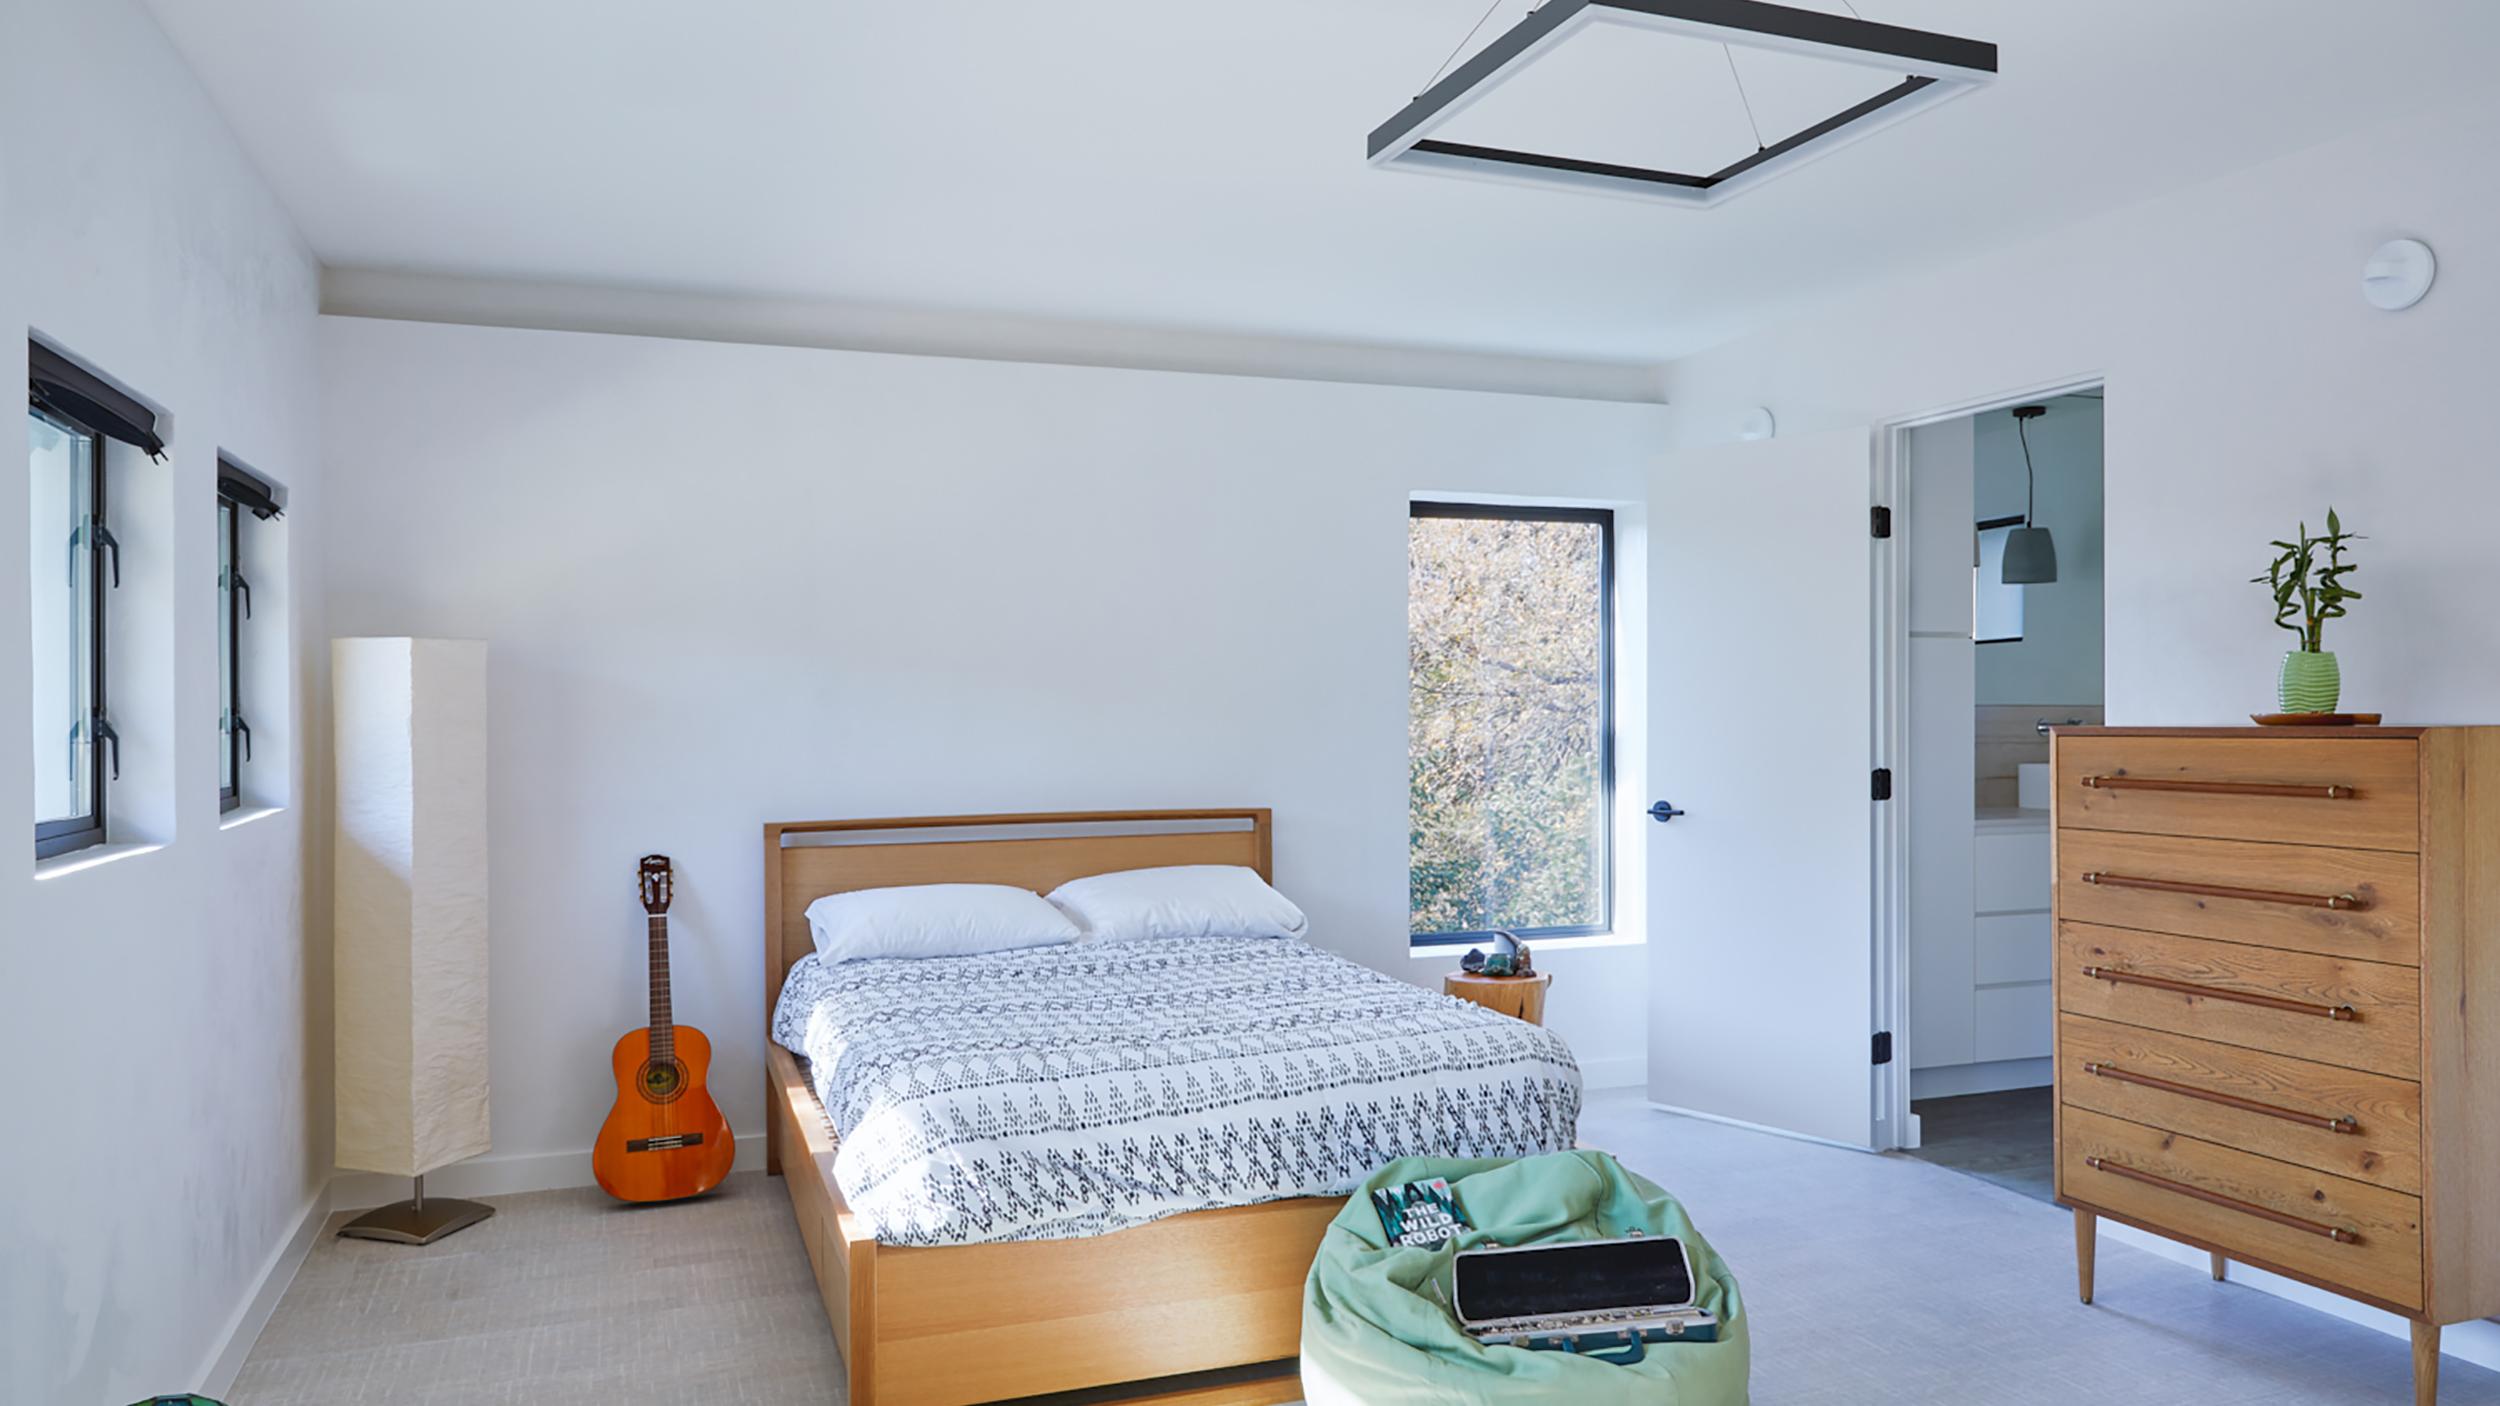 Leonid_Furmansky_bedroom.jpg